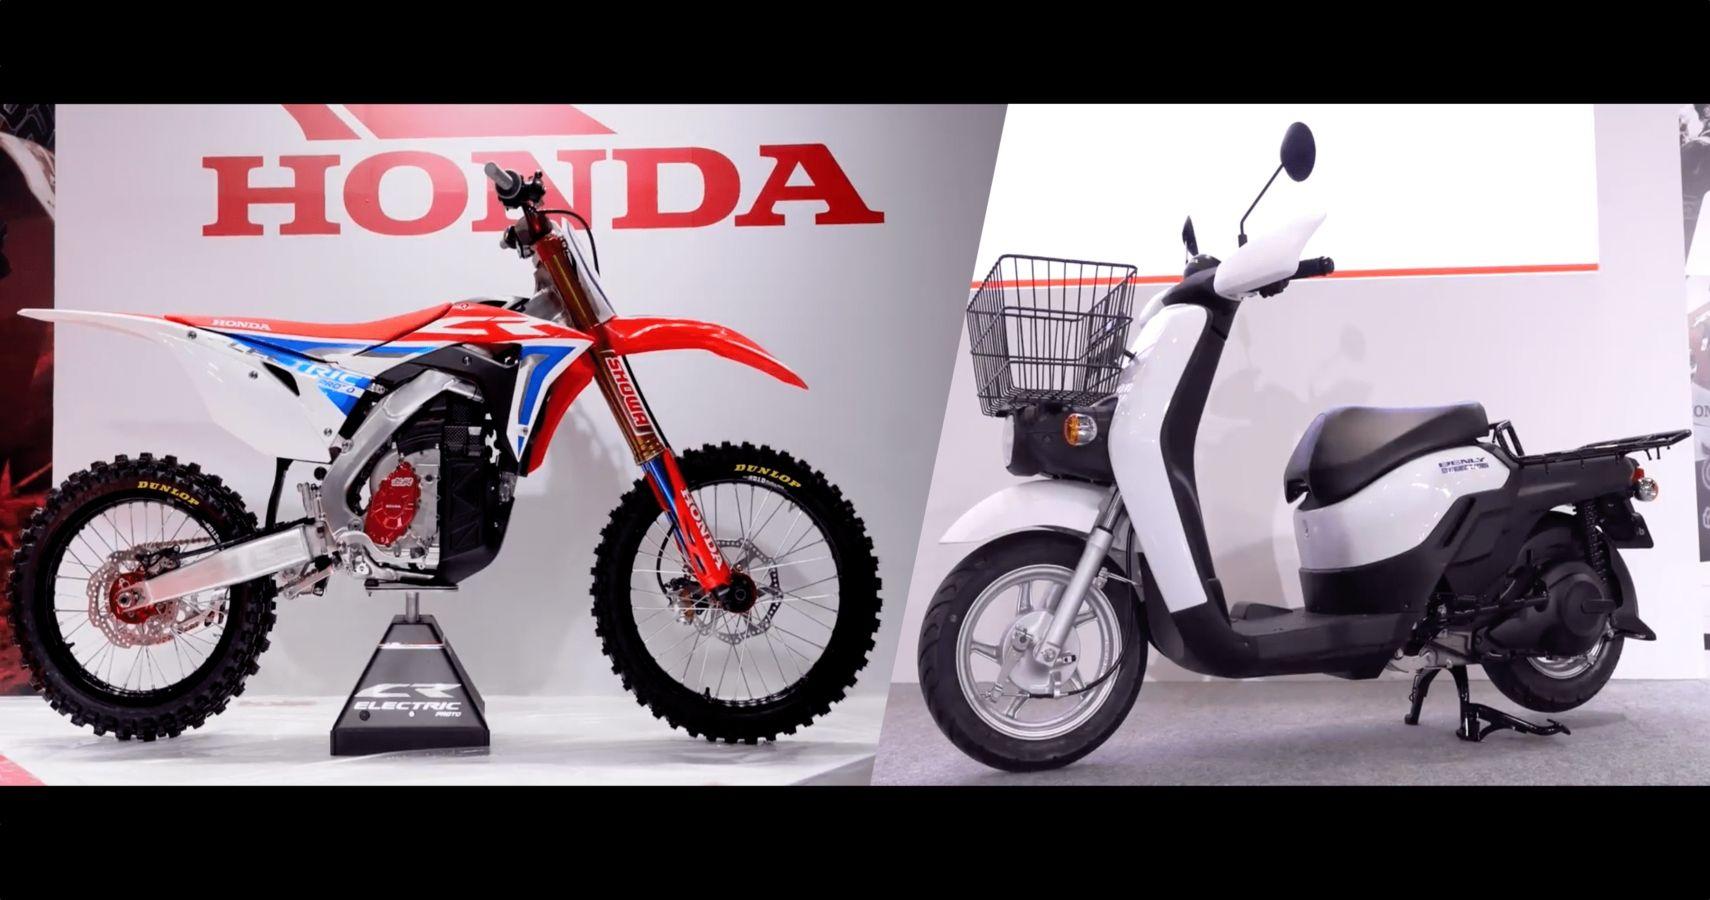 Honda Reveals Electric CRF450 Dirt Bike & Electric Scooter